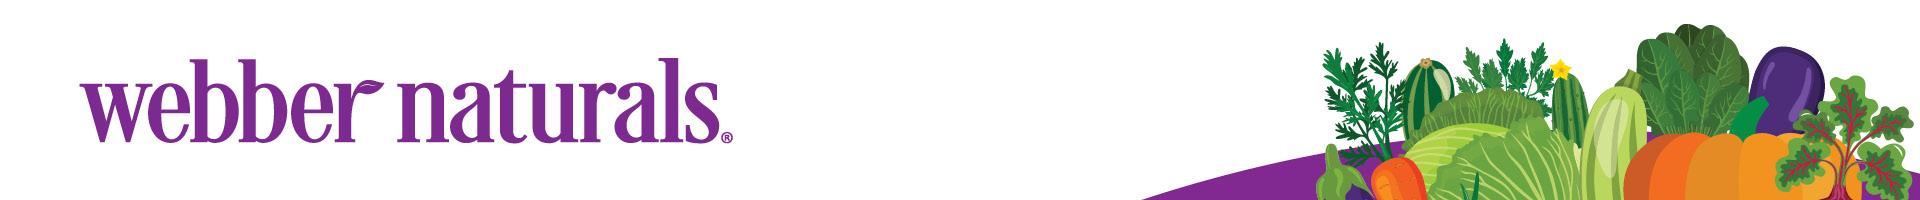 baner-revita-NF%20s%20dostavka_1920x200_1.jpg